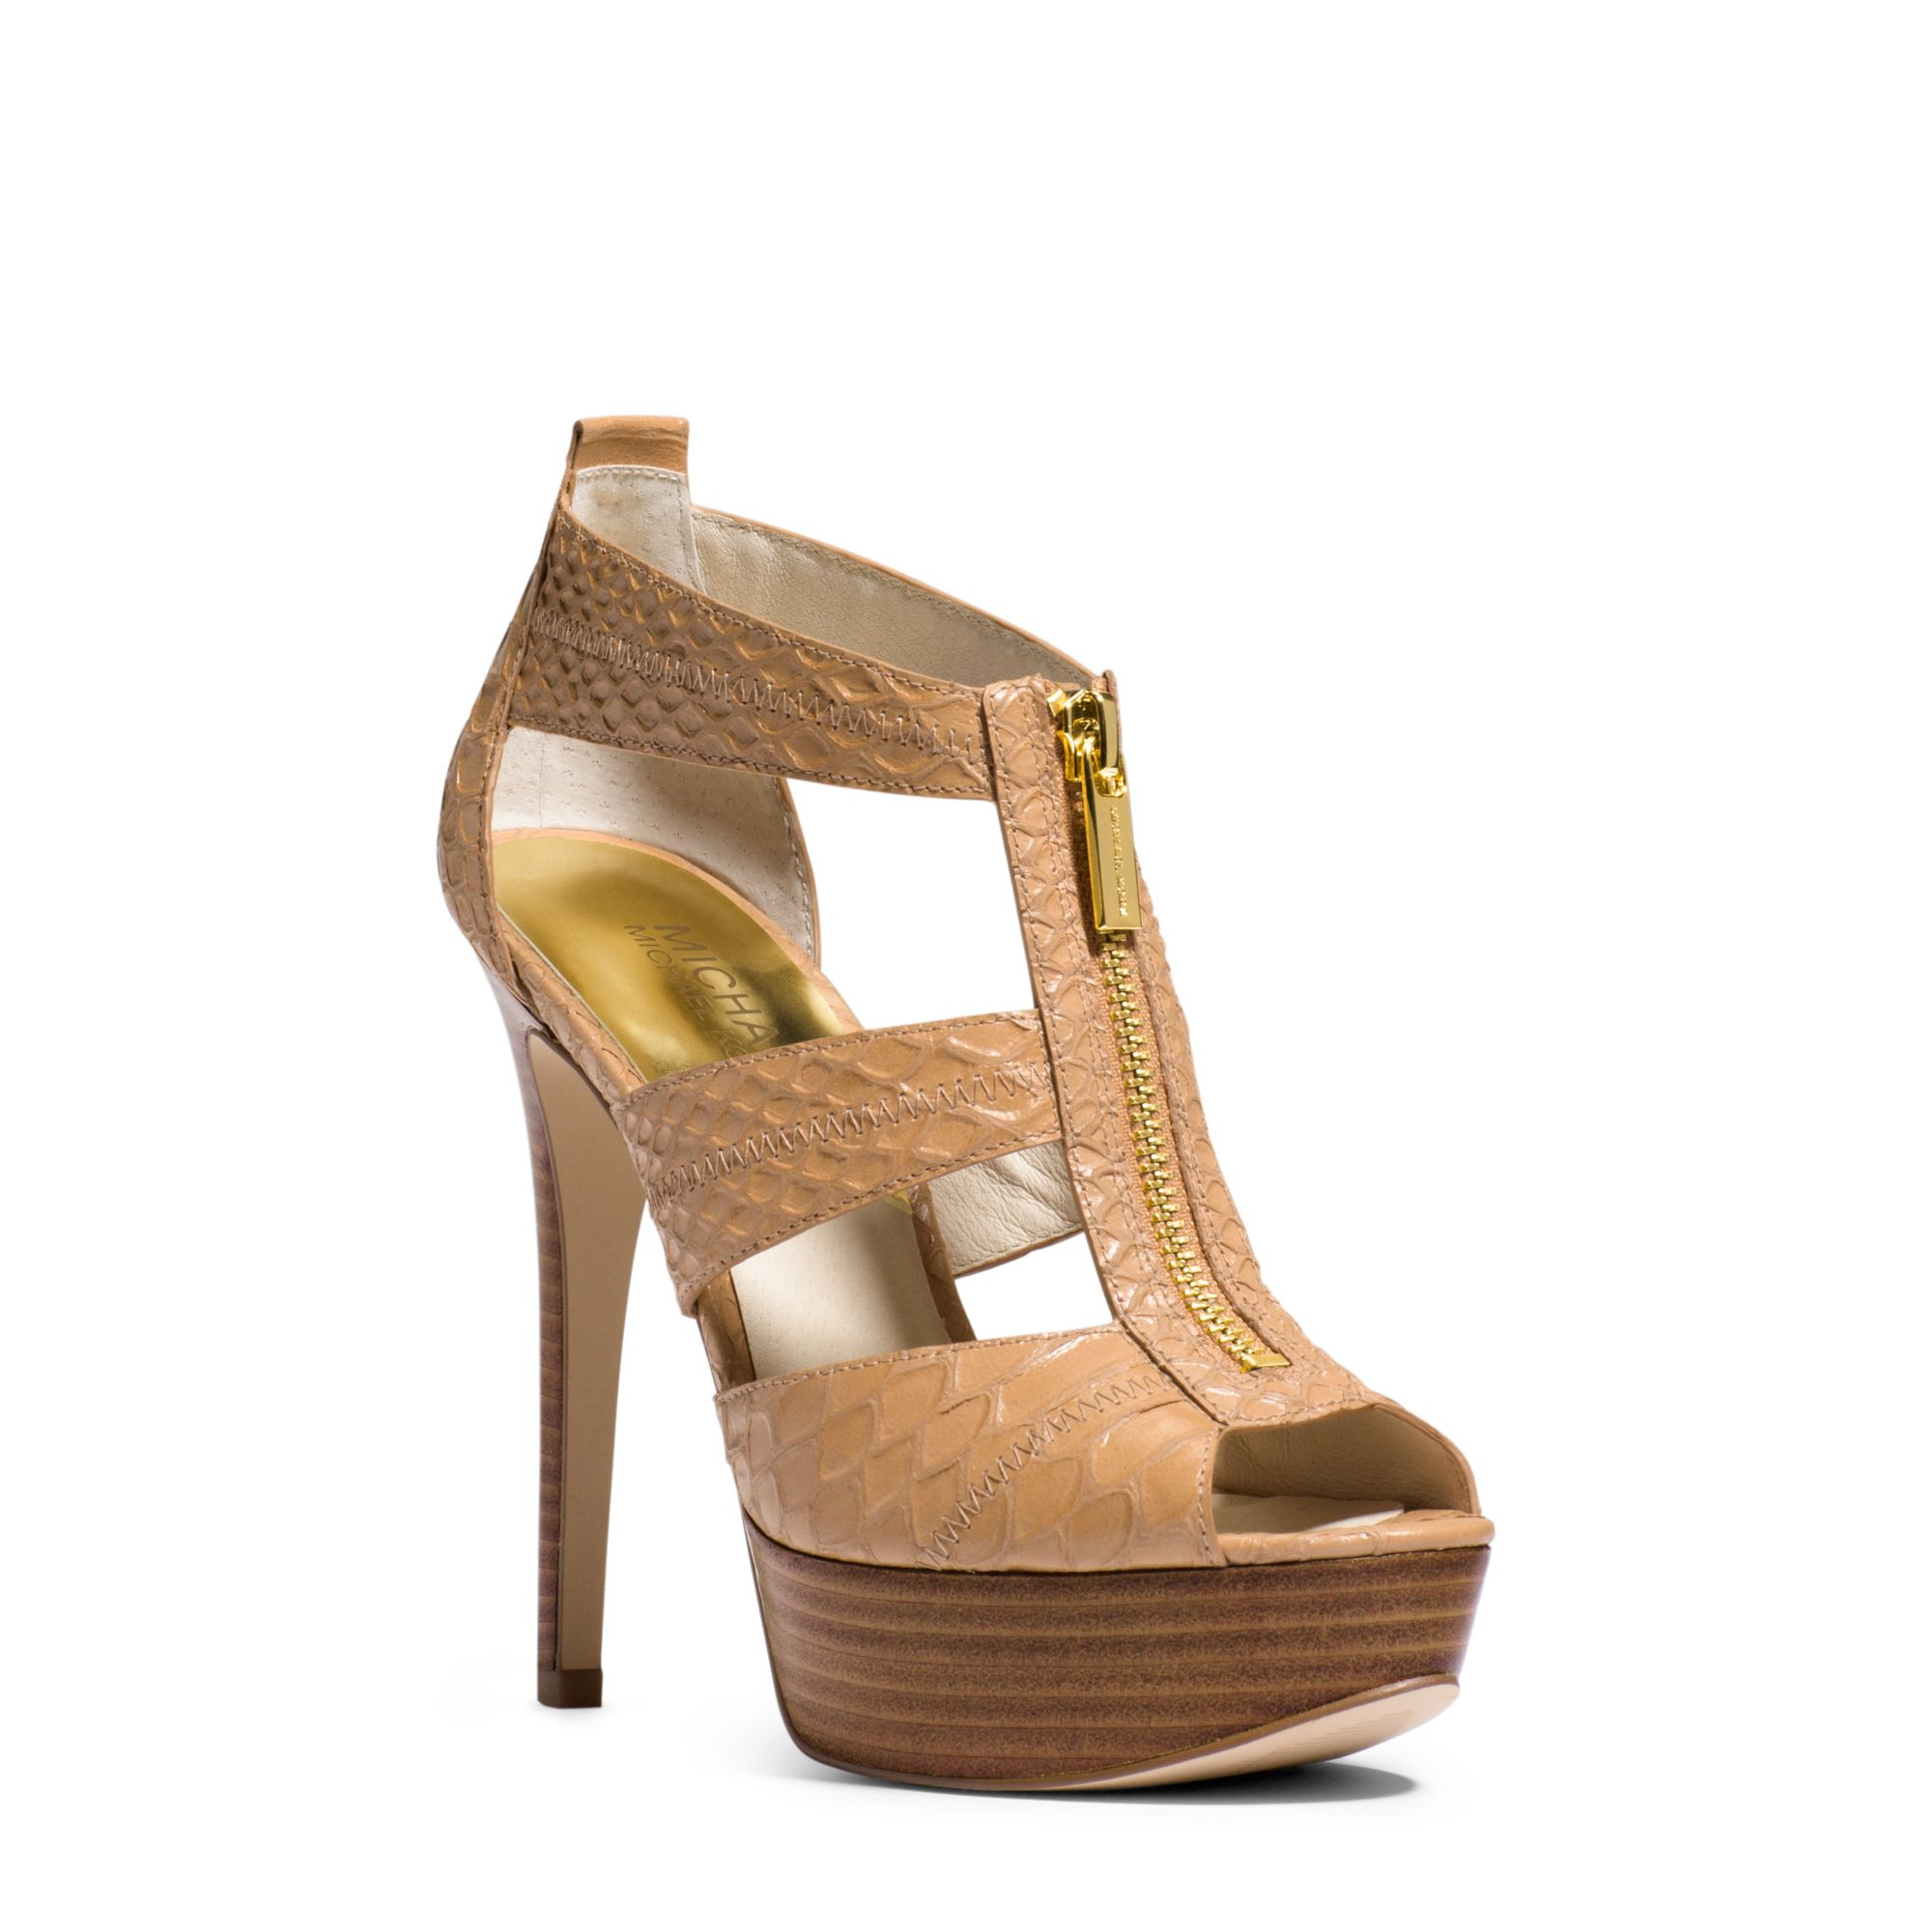 4bfa5328a2cc Lyst - Michael Kors Berkley Embossed-leather Platform Sandal